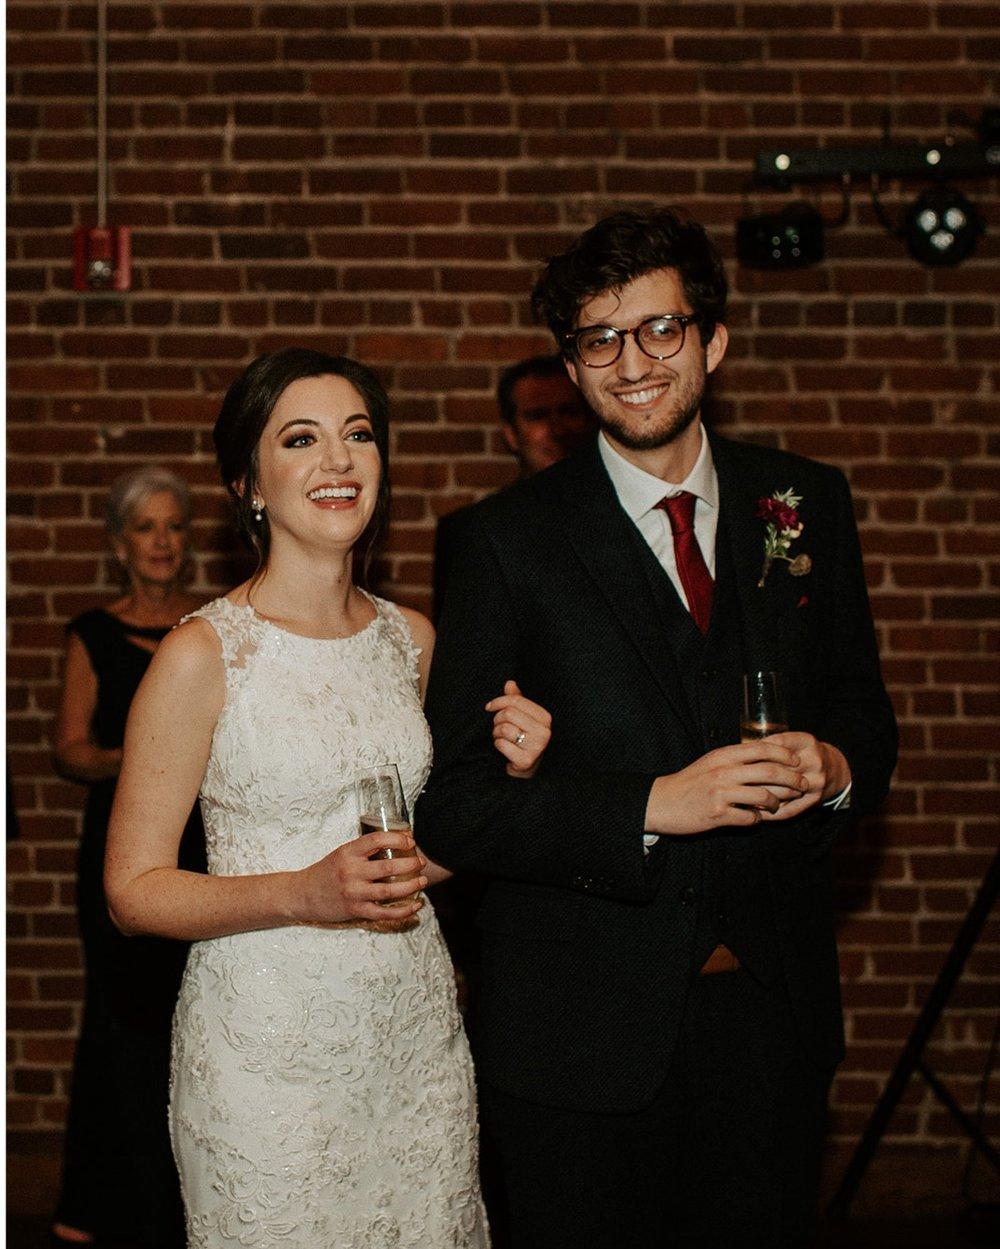 Industrial Downtown Birmingham, Alabamam Wedding | Alabama Wedding Photographer